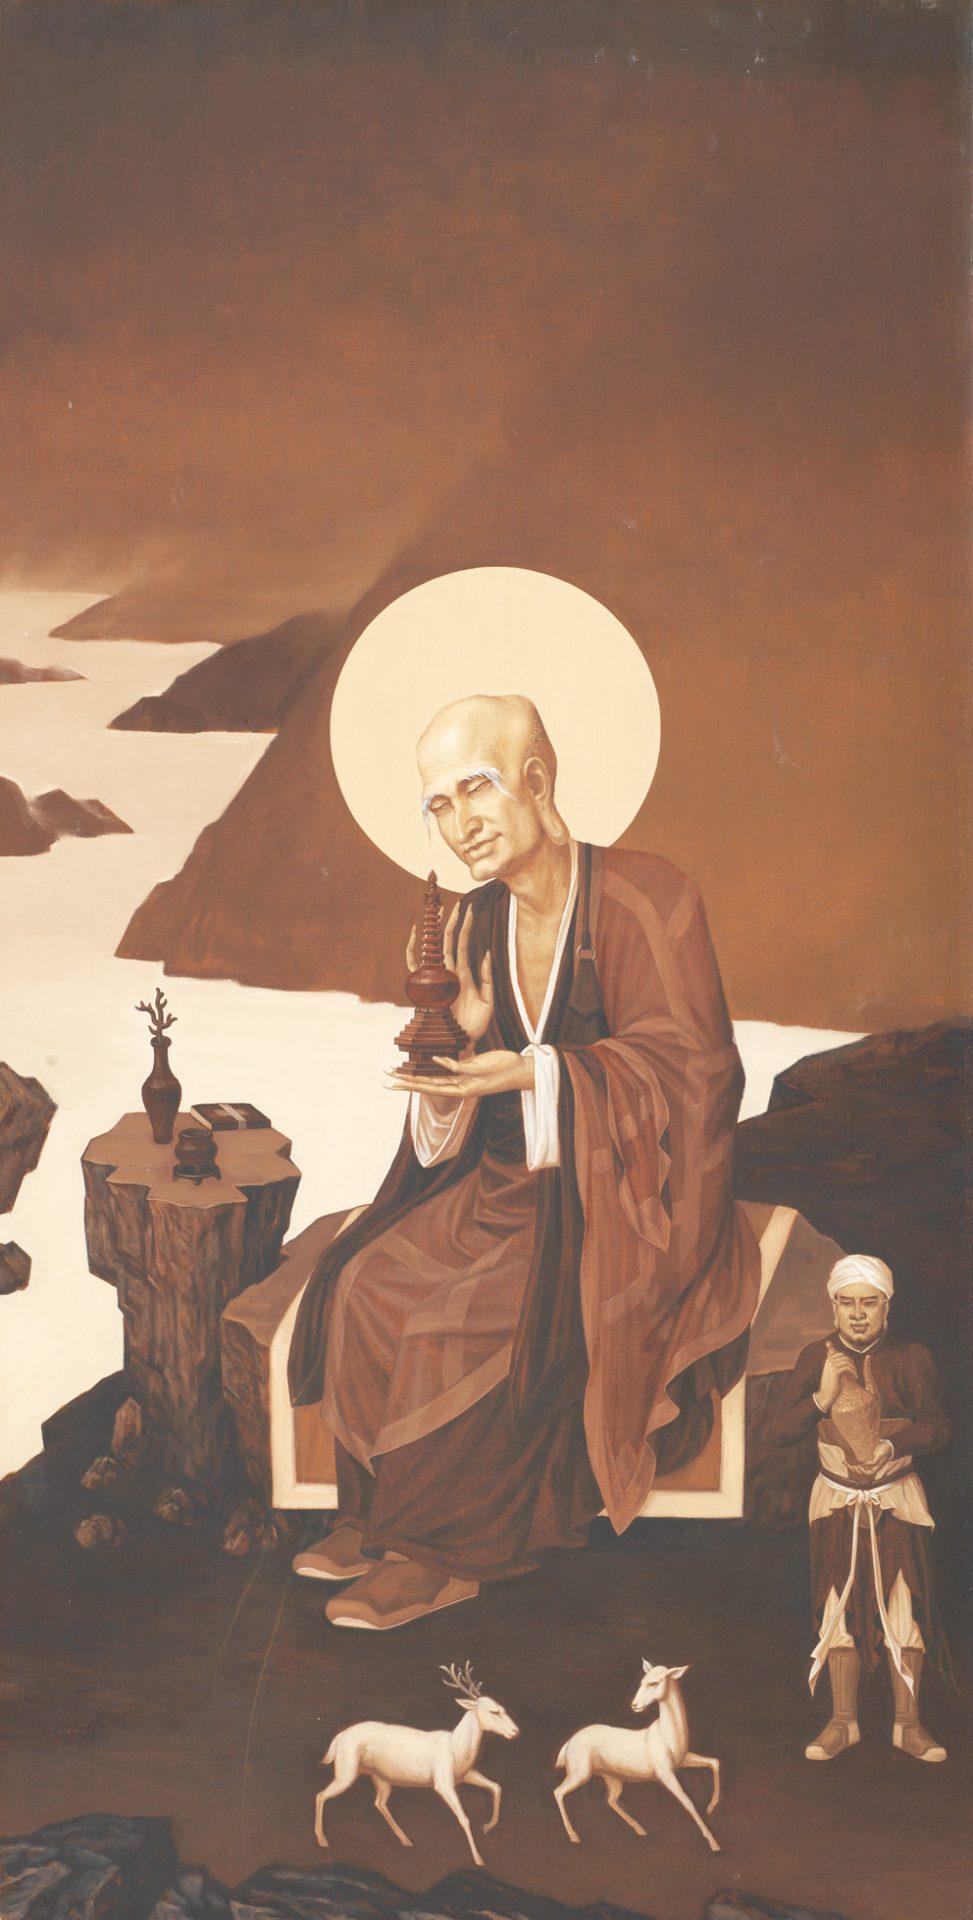 Arhatabheda by Tong Chengming